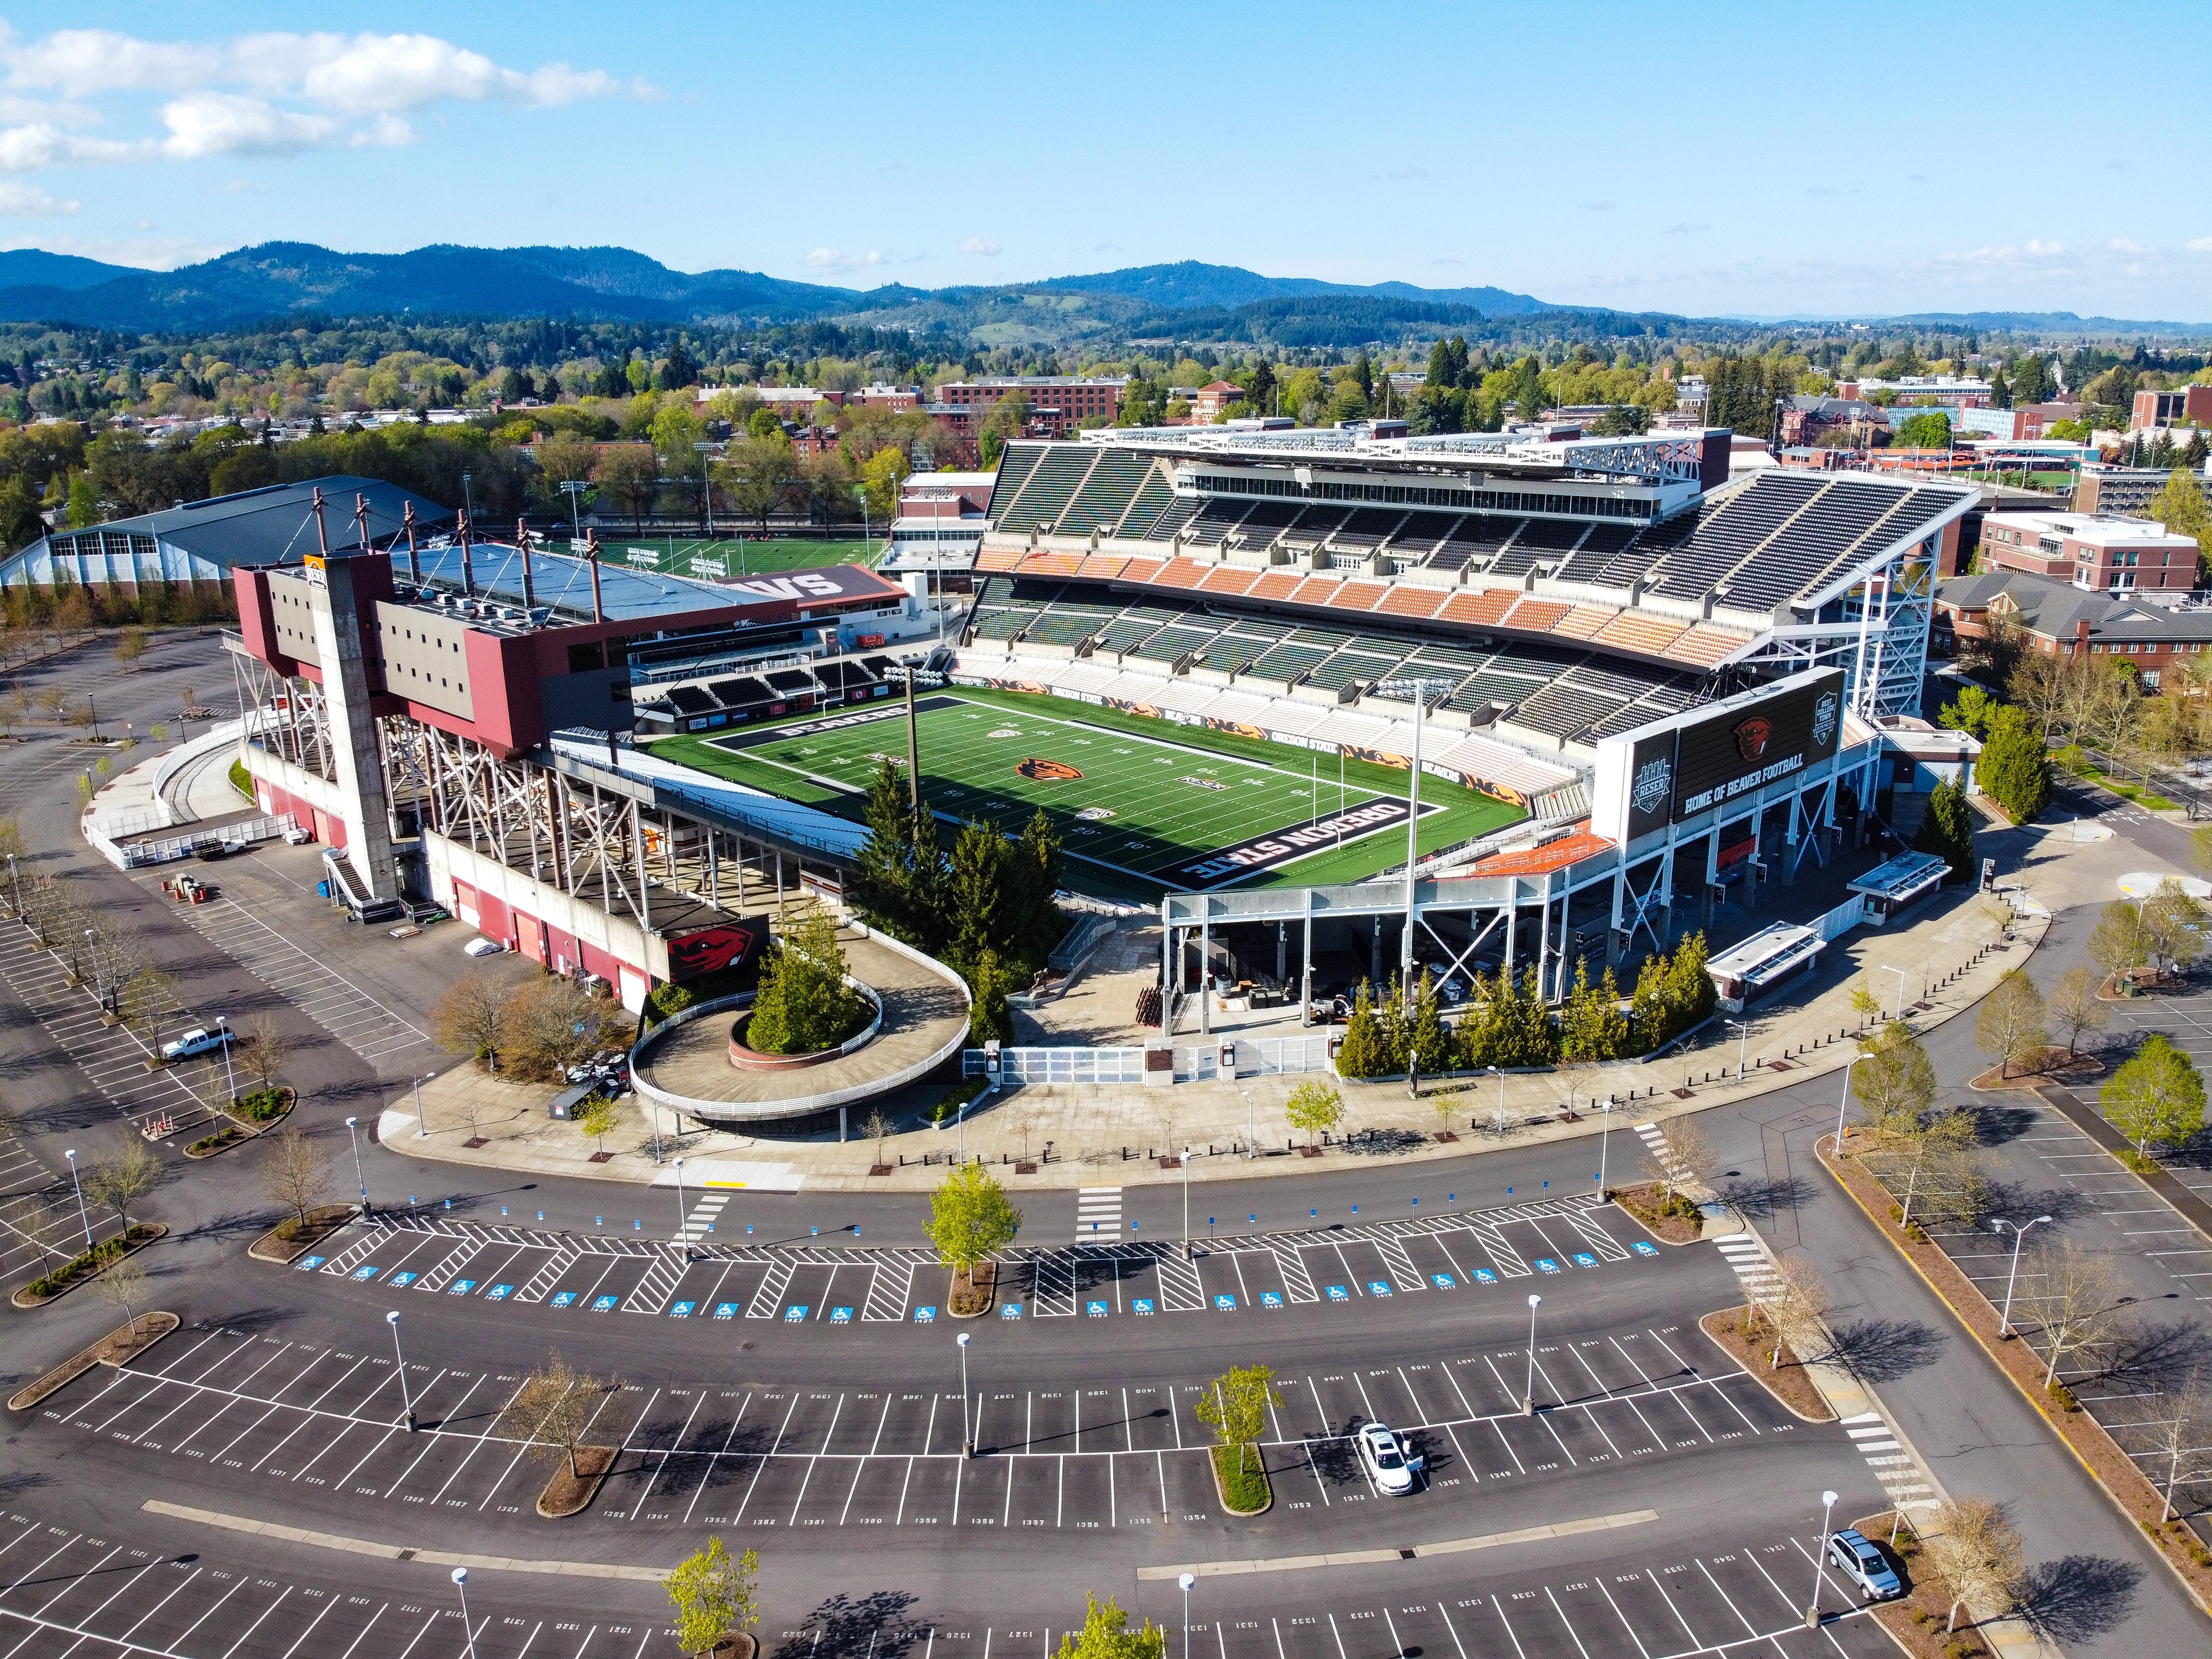 stadium and parking lot